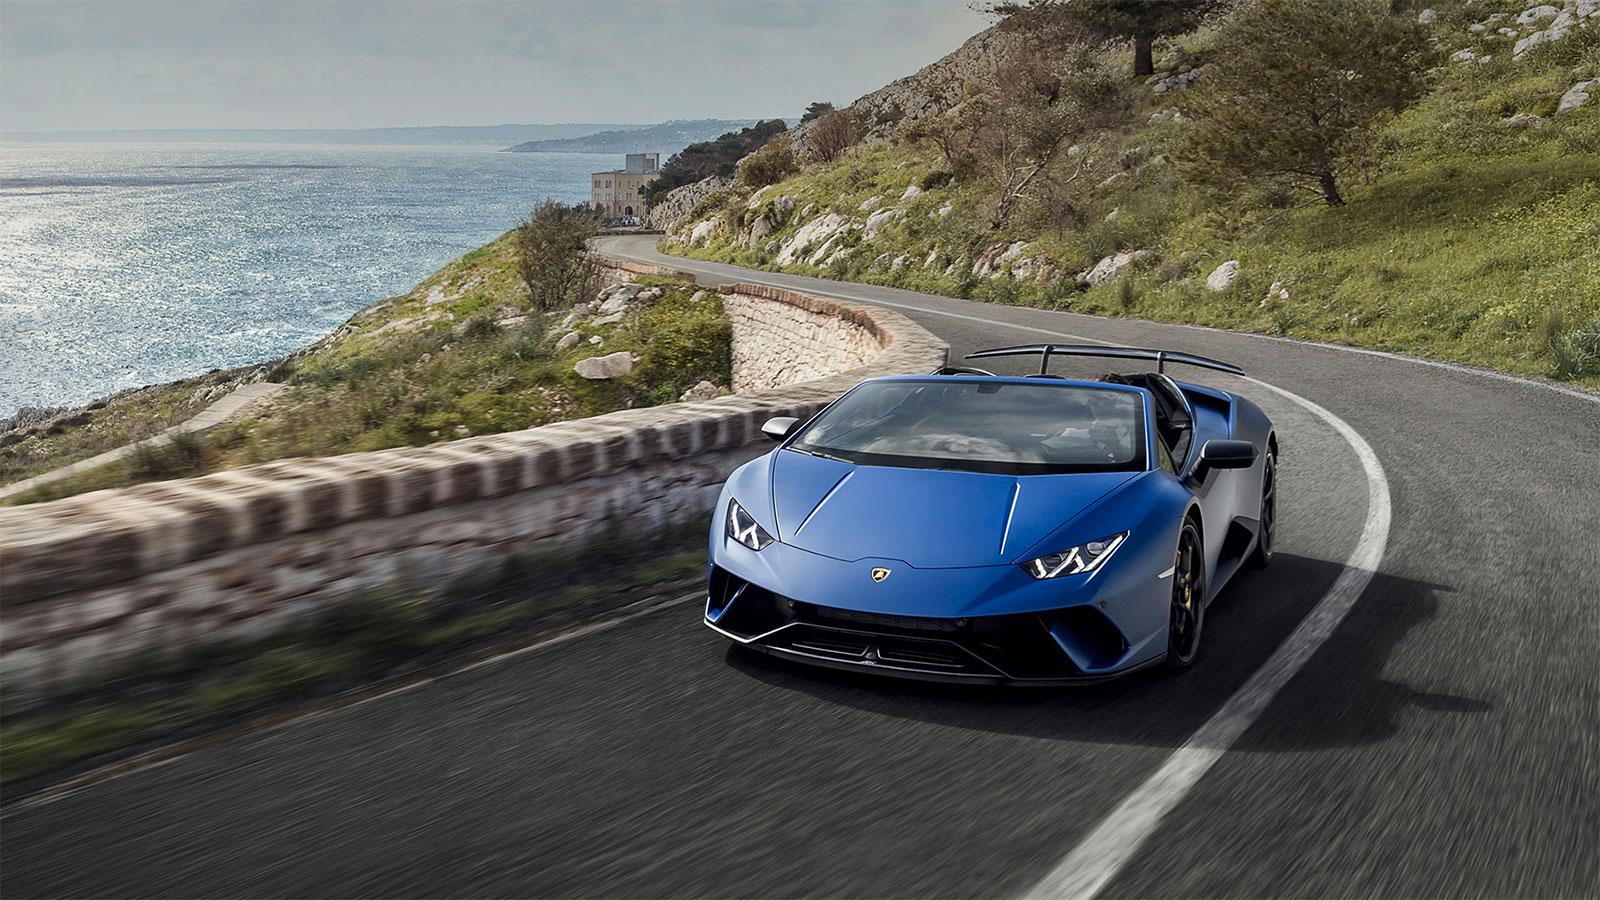 Lamborghini Huracan Performante Spyder - Vivid Technology image 1